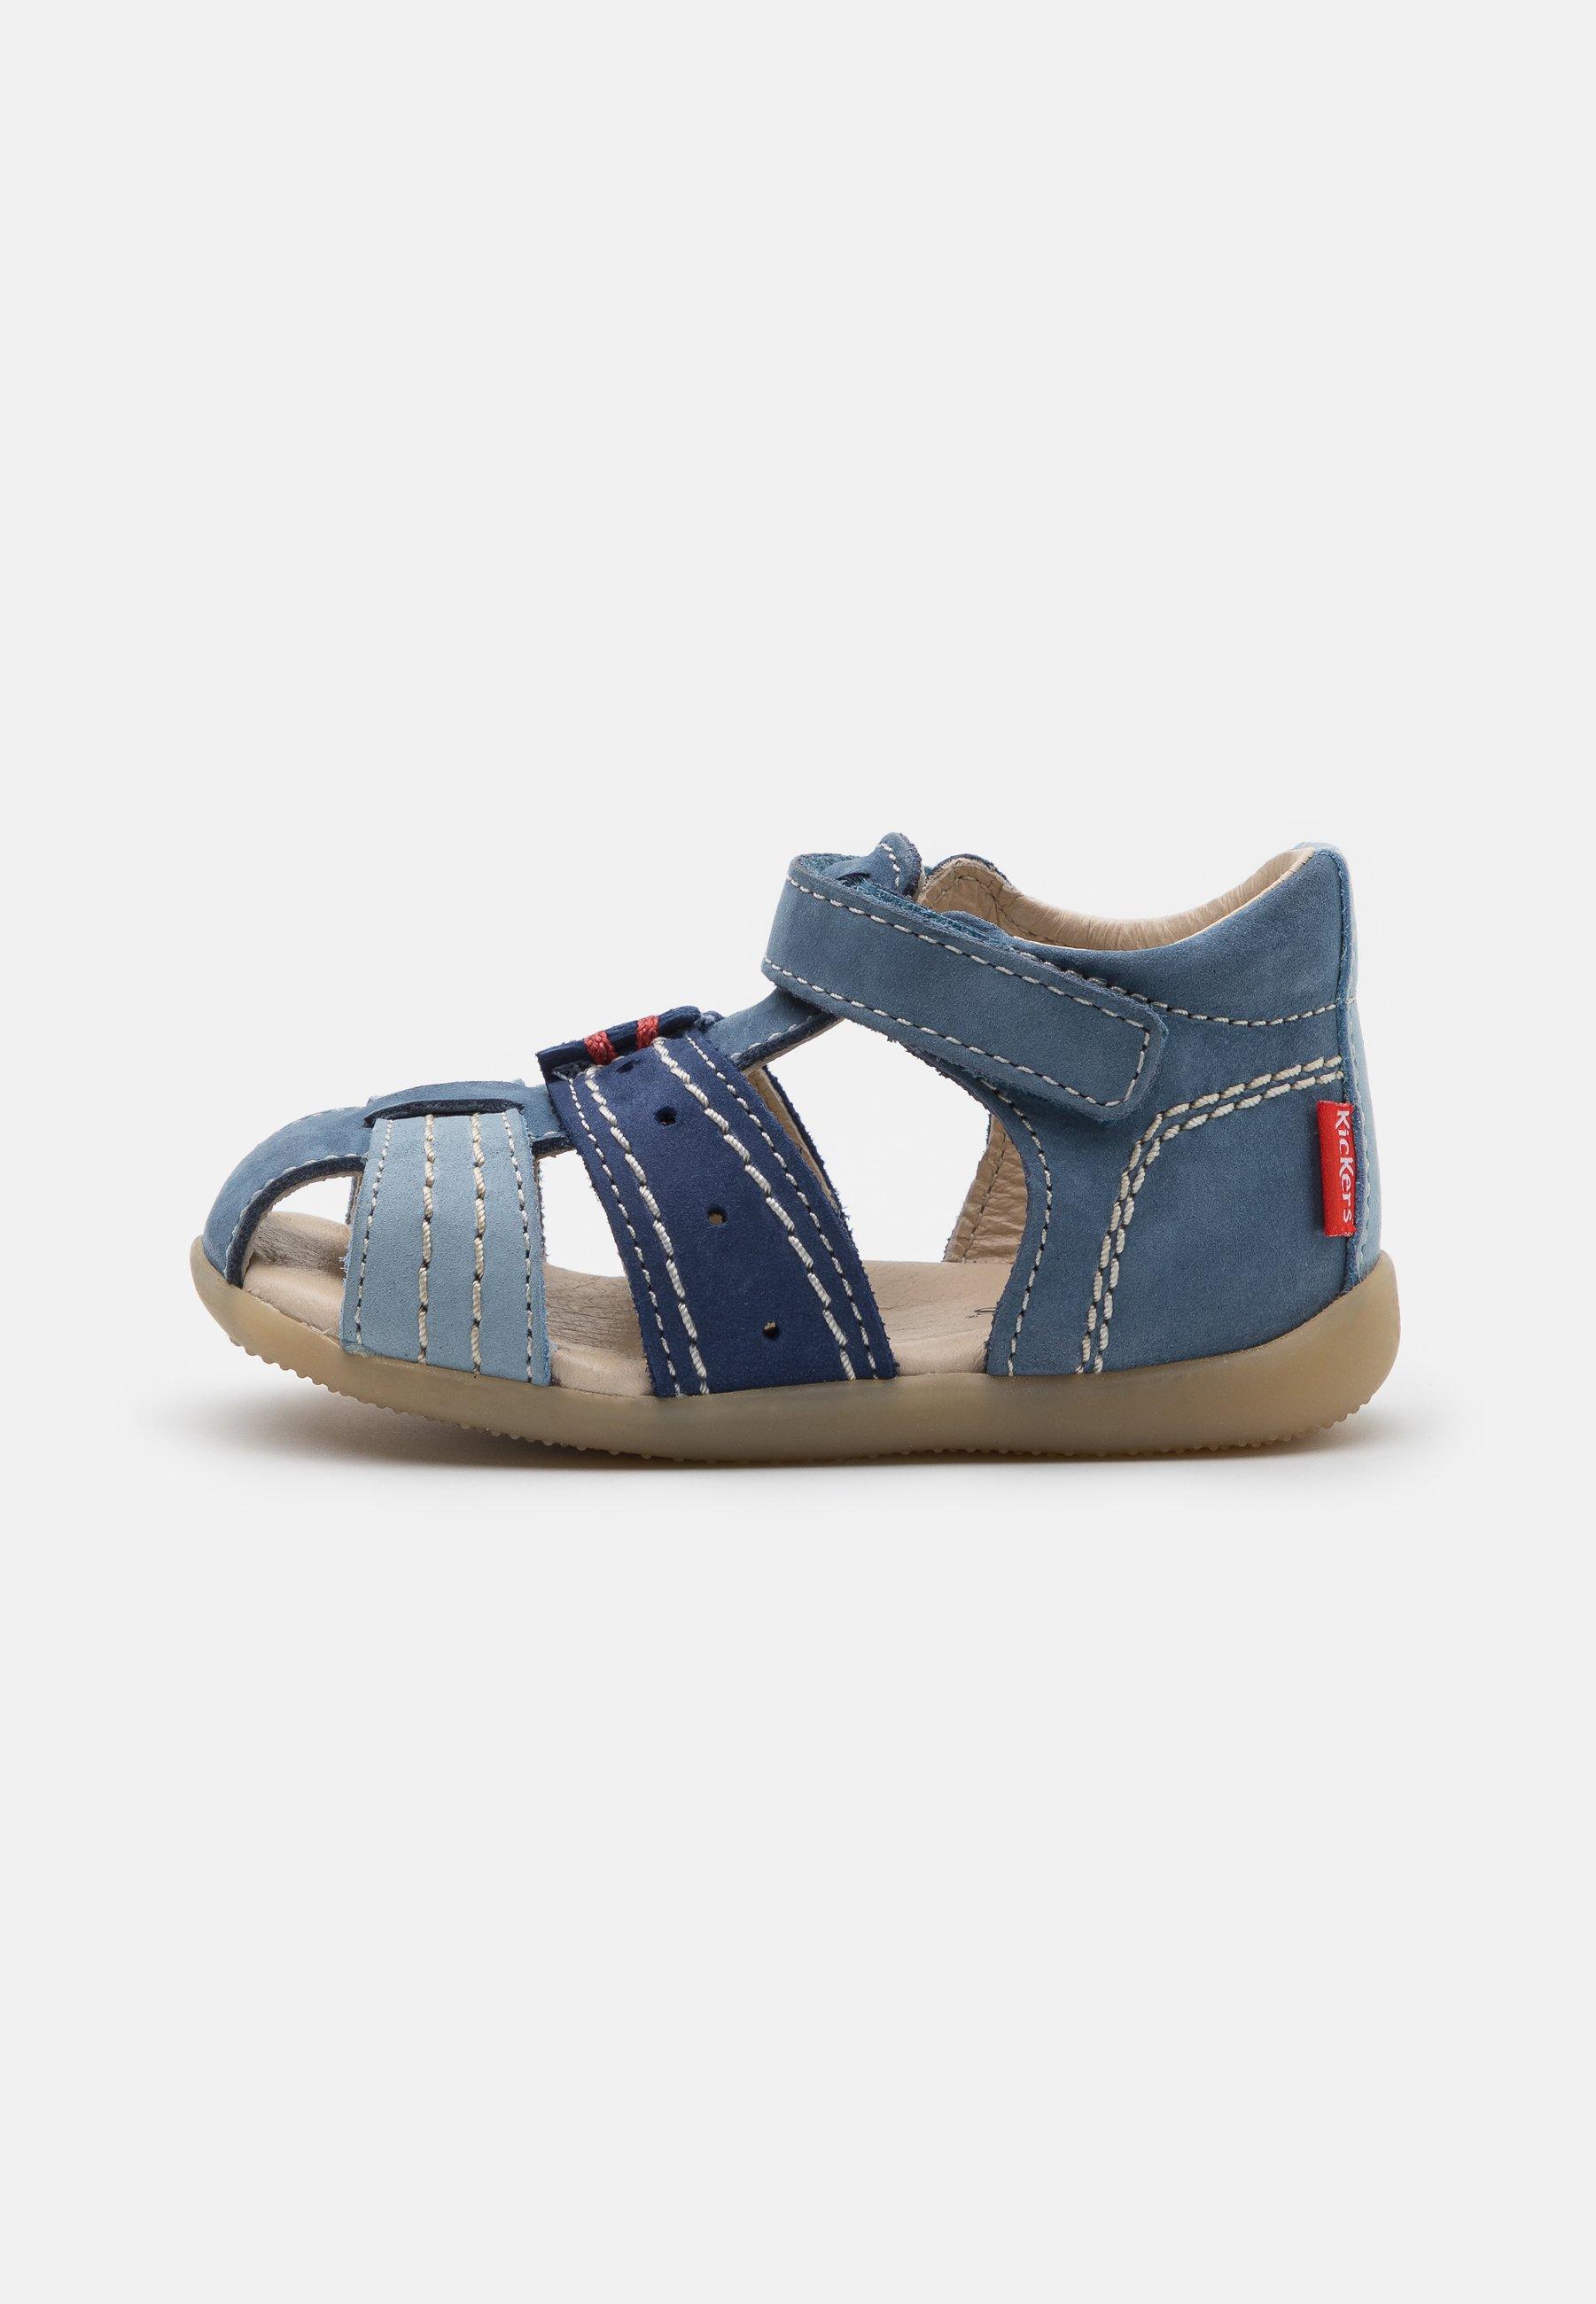 Kids BIGBAZAR - Sandals - bleu